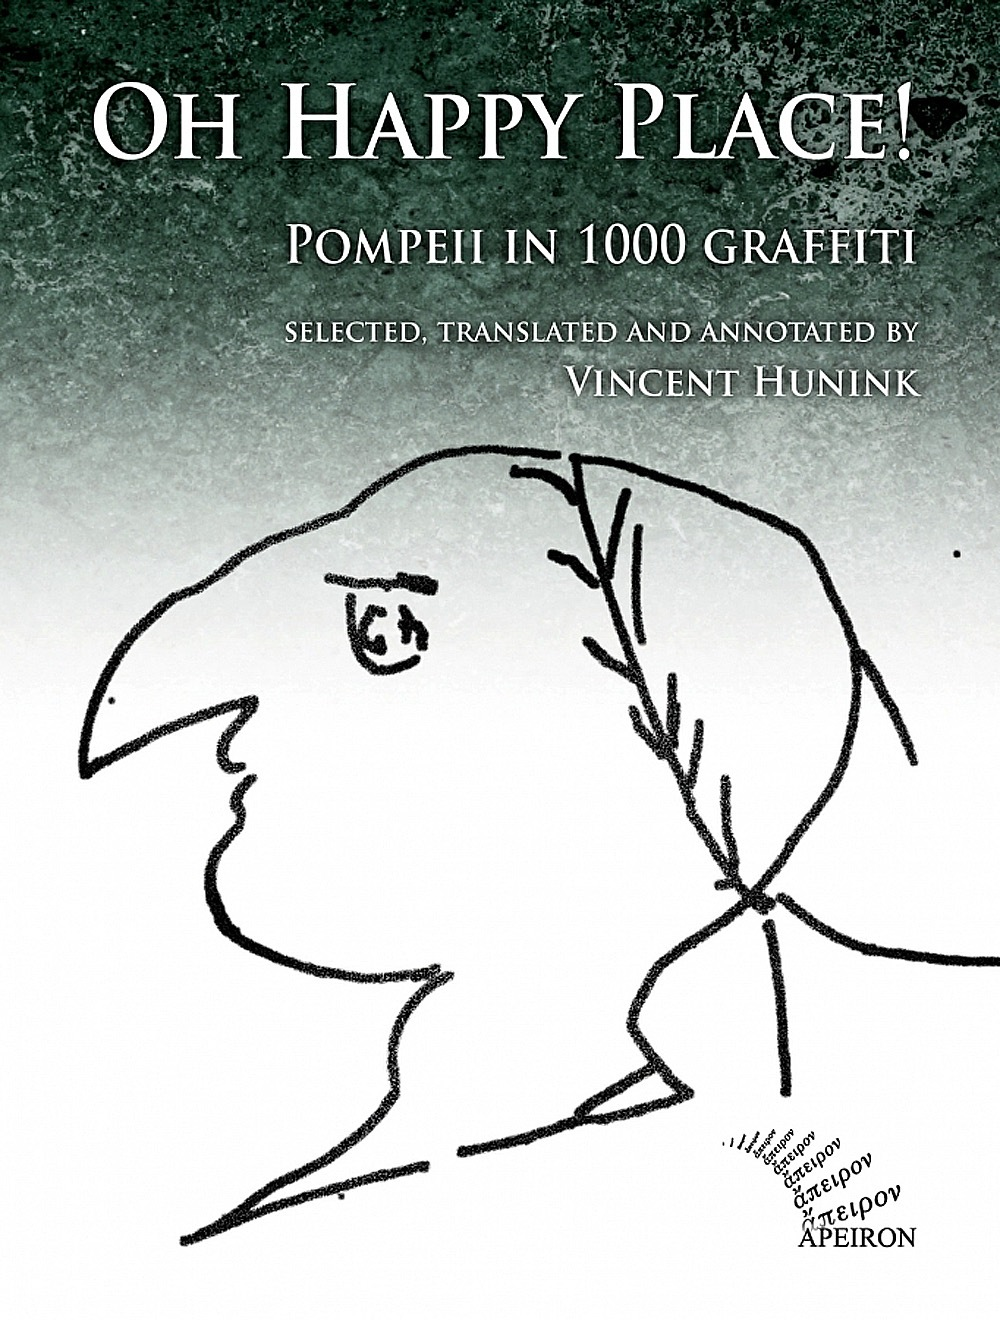 Oh Happy Place! Pompeii in 1000 graffiti